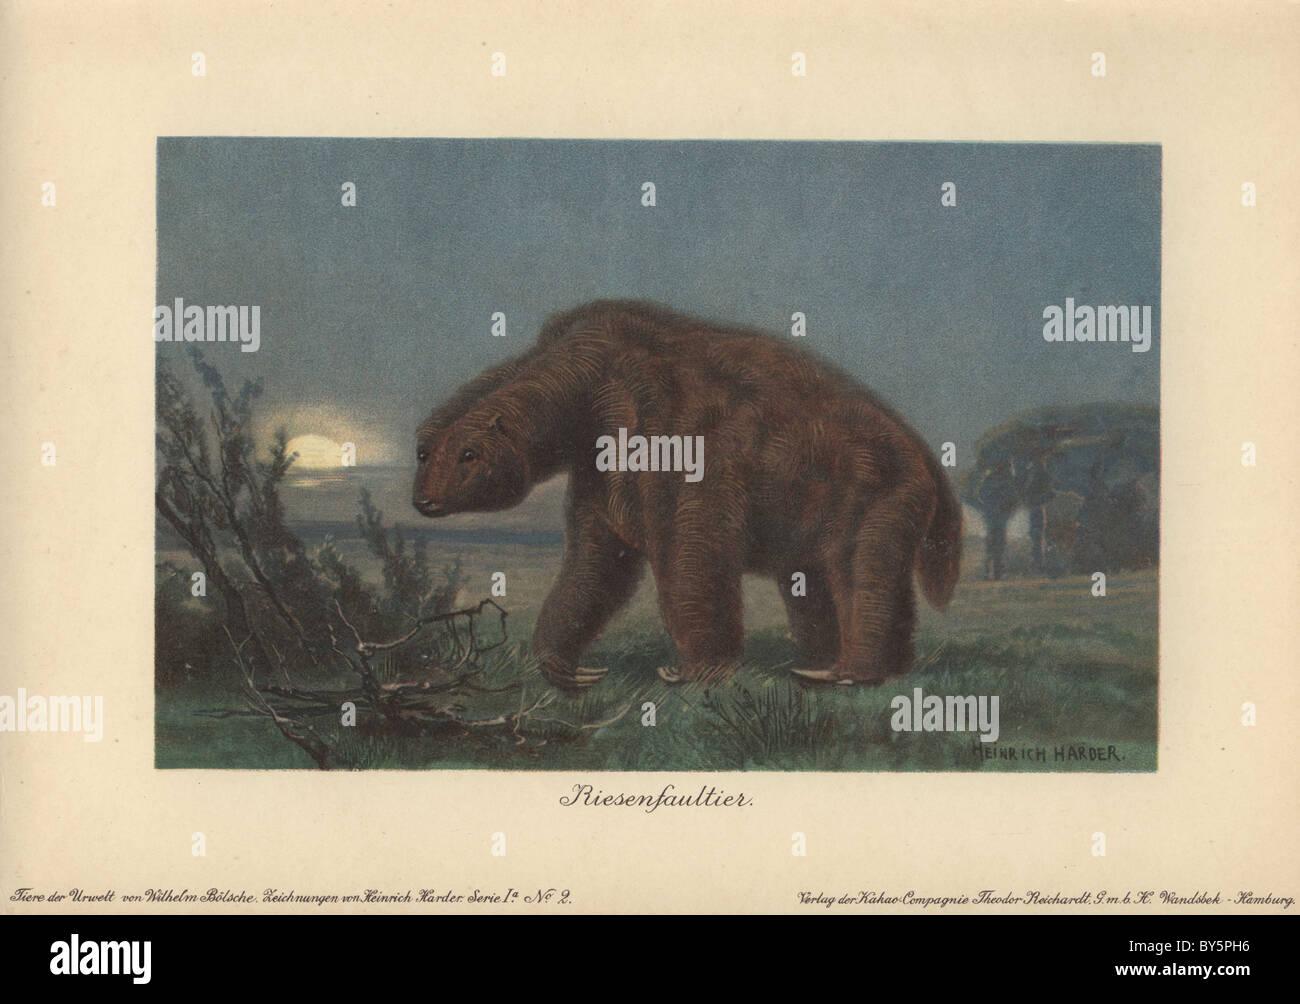 Megatherium americanum (Great Beast) was a genus of elephant-sized ground sloths. - Stock Image